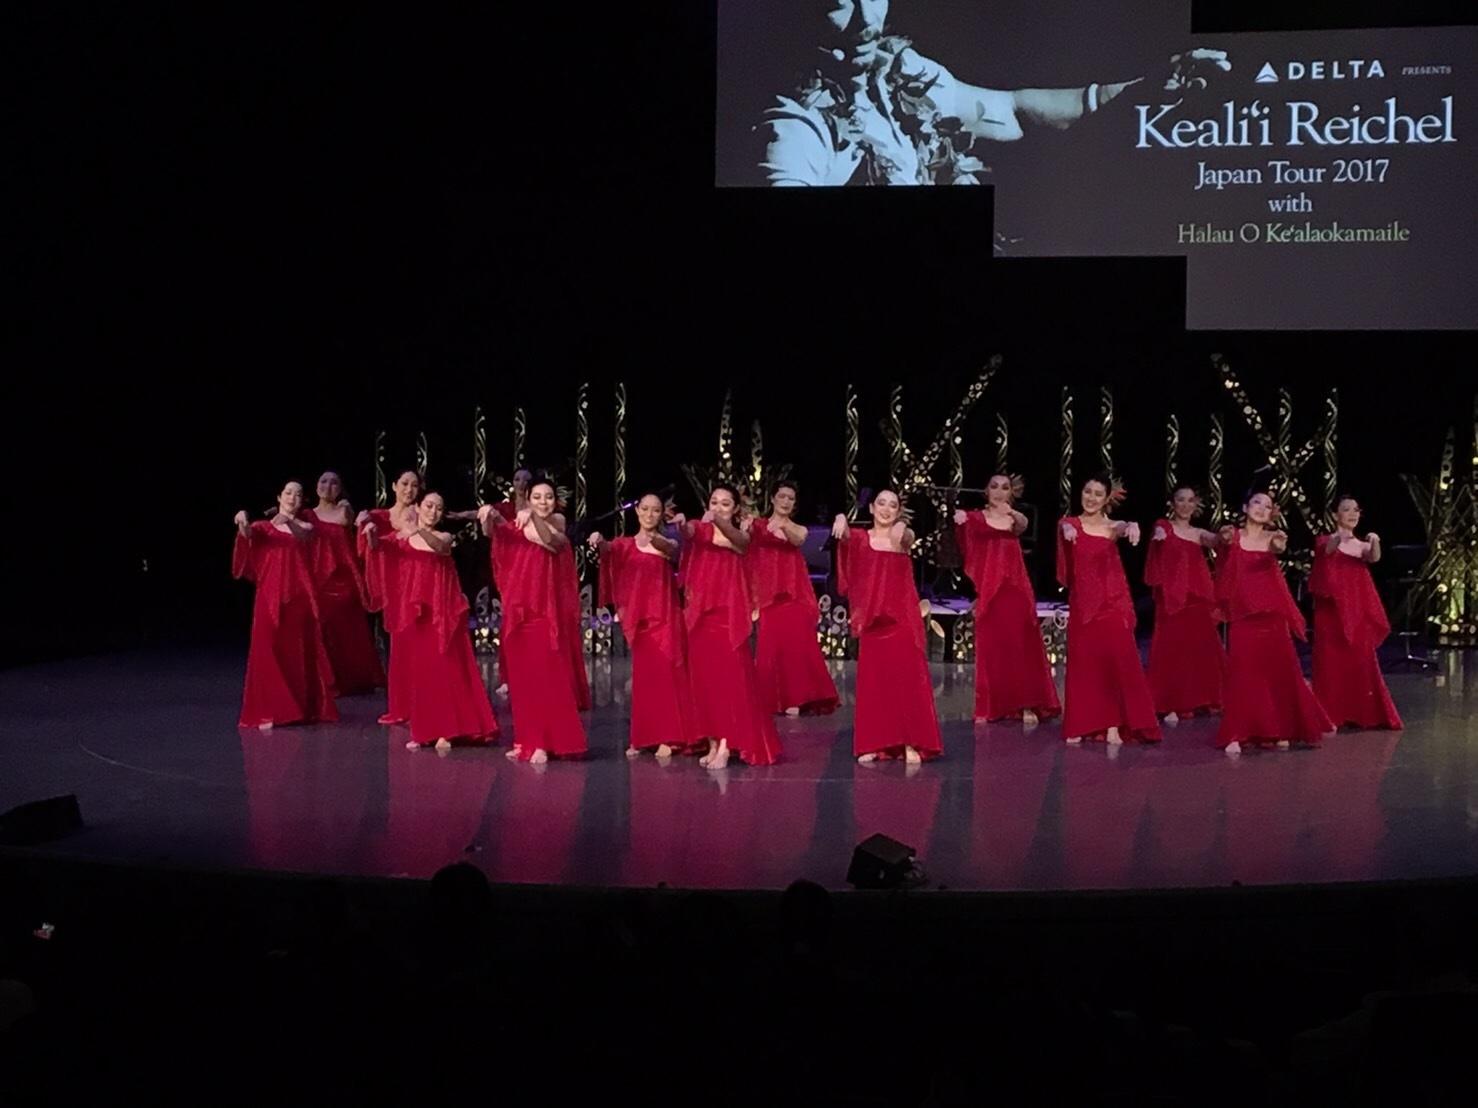 Kealiʻi Reichel Japan Tour 2017_d0256587_21085243.jpeg